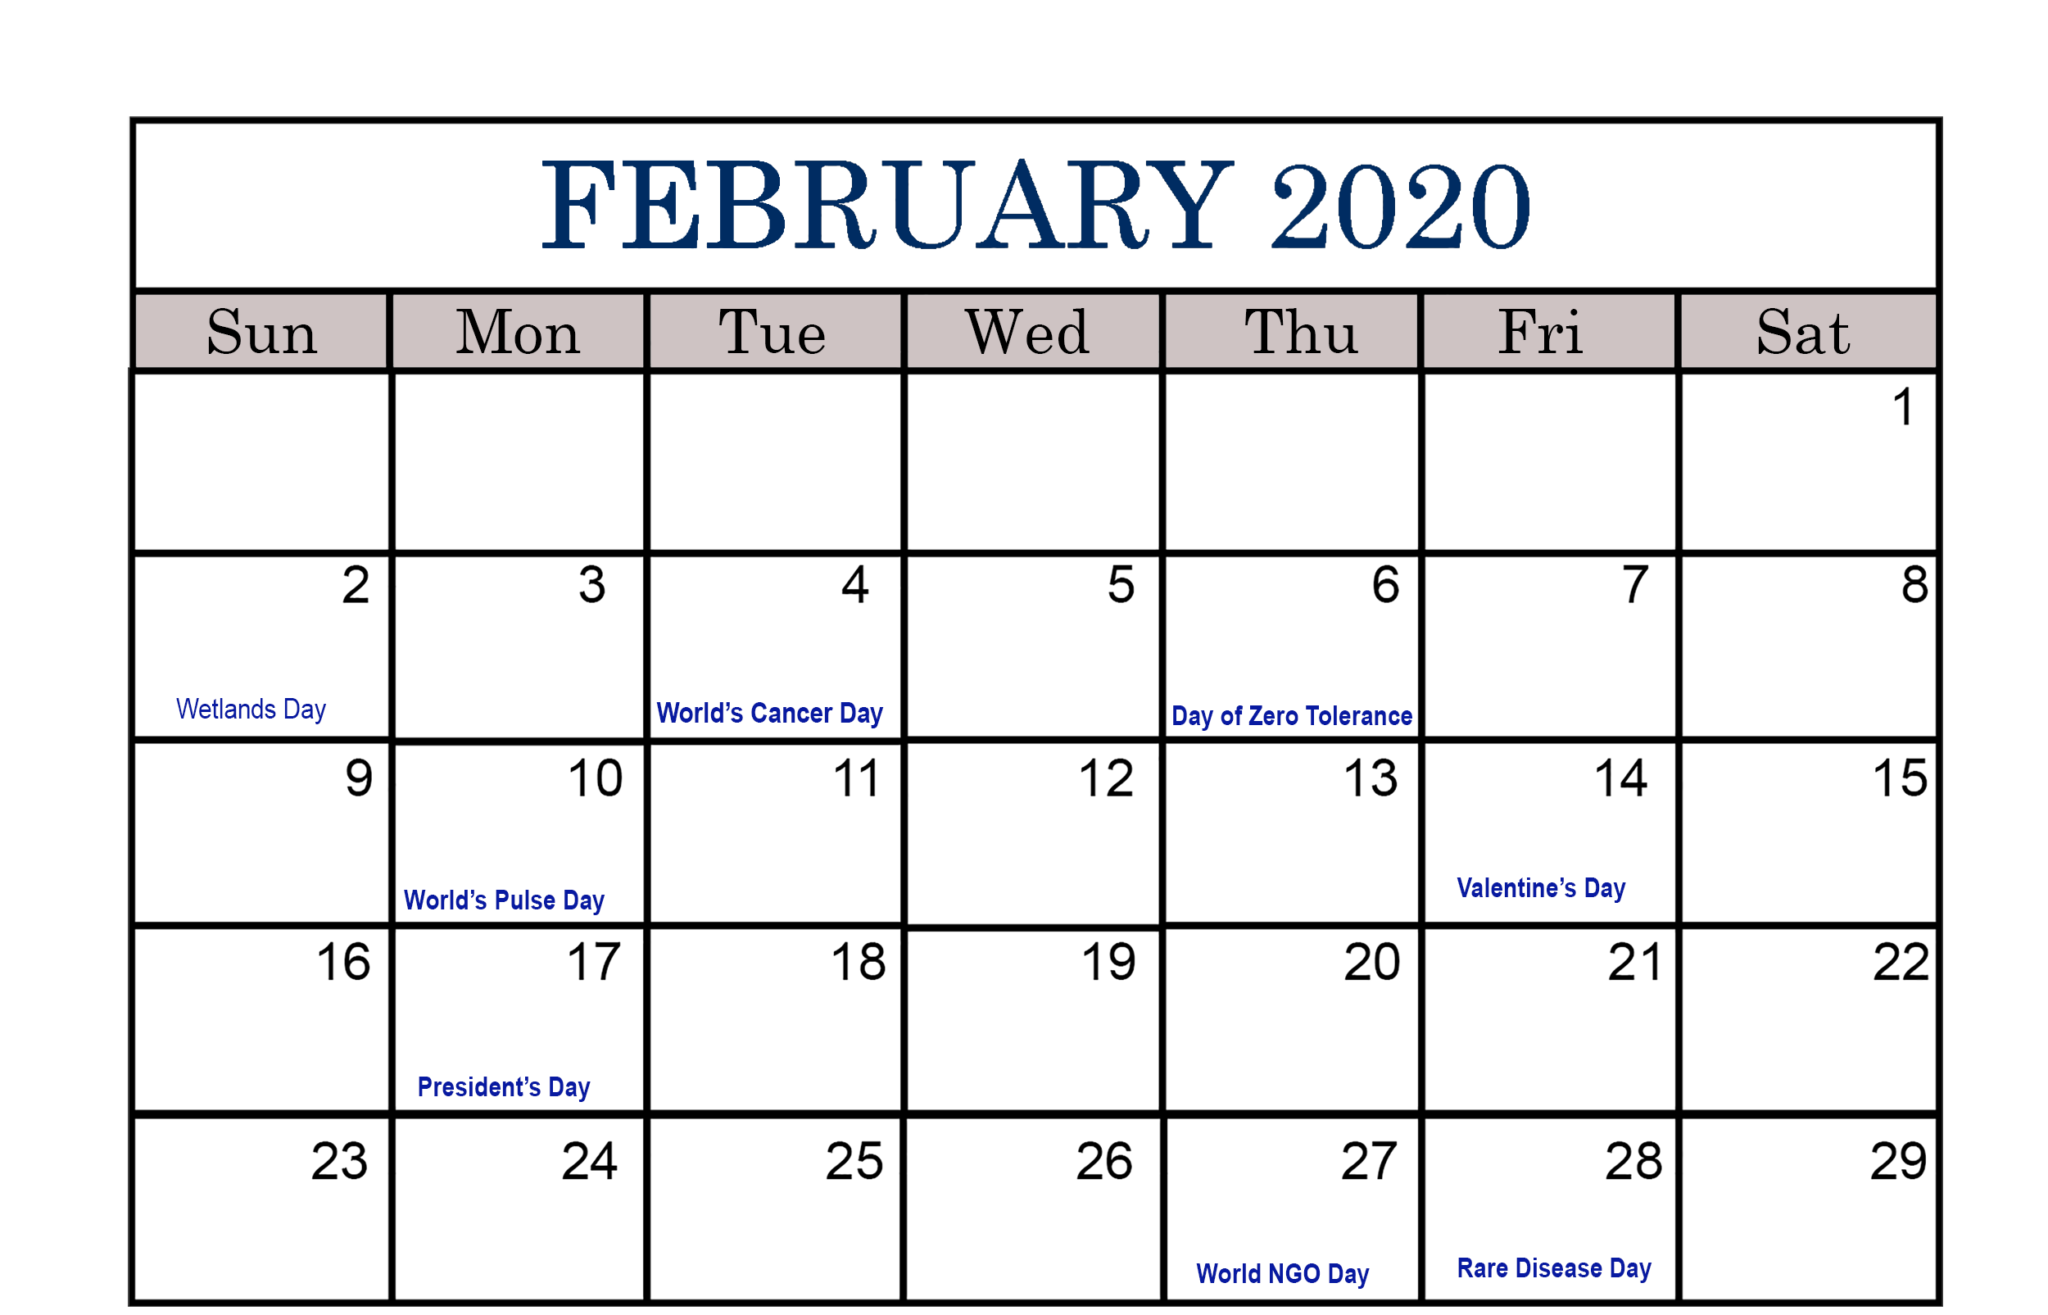 Fillable February Calendar 2020 Template